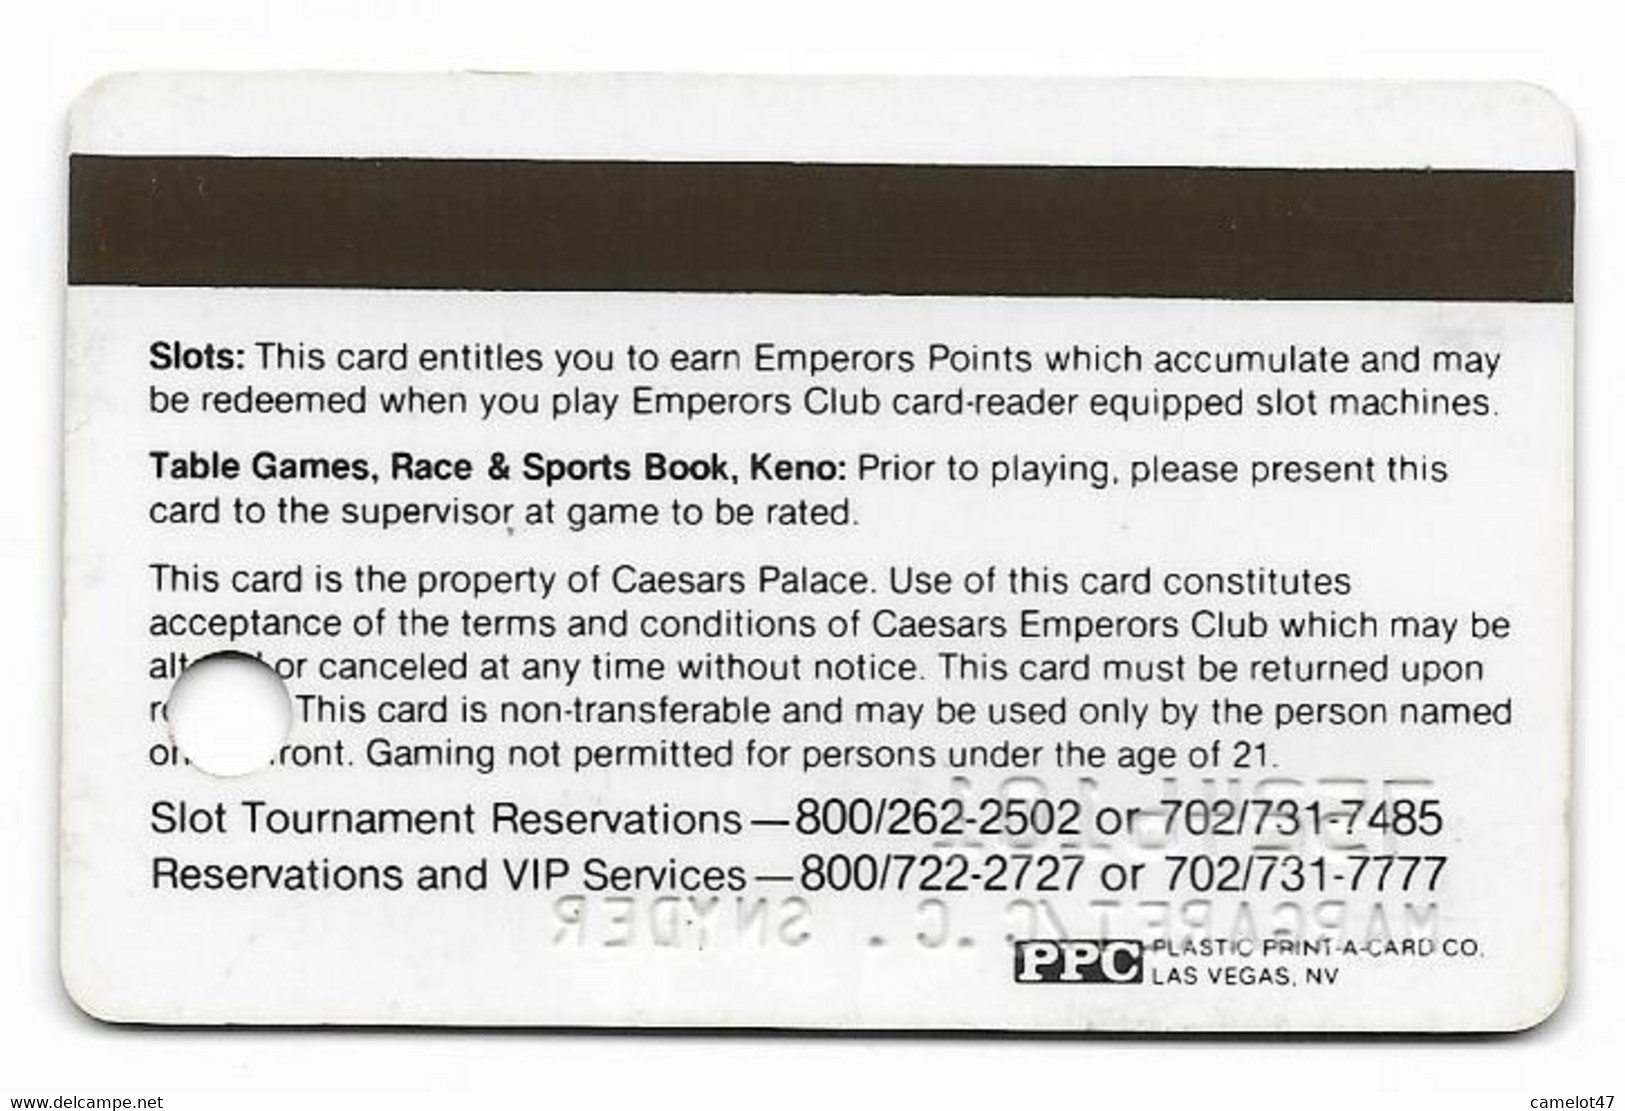 Caesars Palace Casino,Las Vegas, Older Used Slot Or Player's Card, # Caesars-6 - Casino Cards